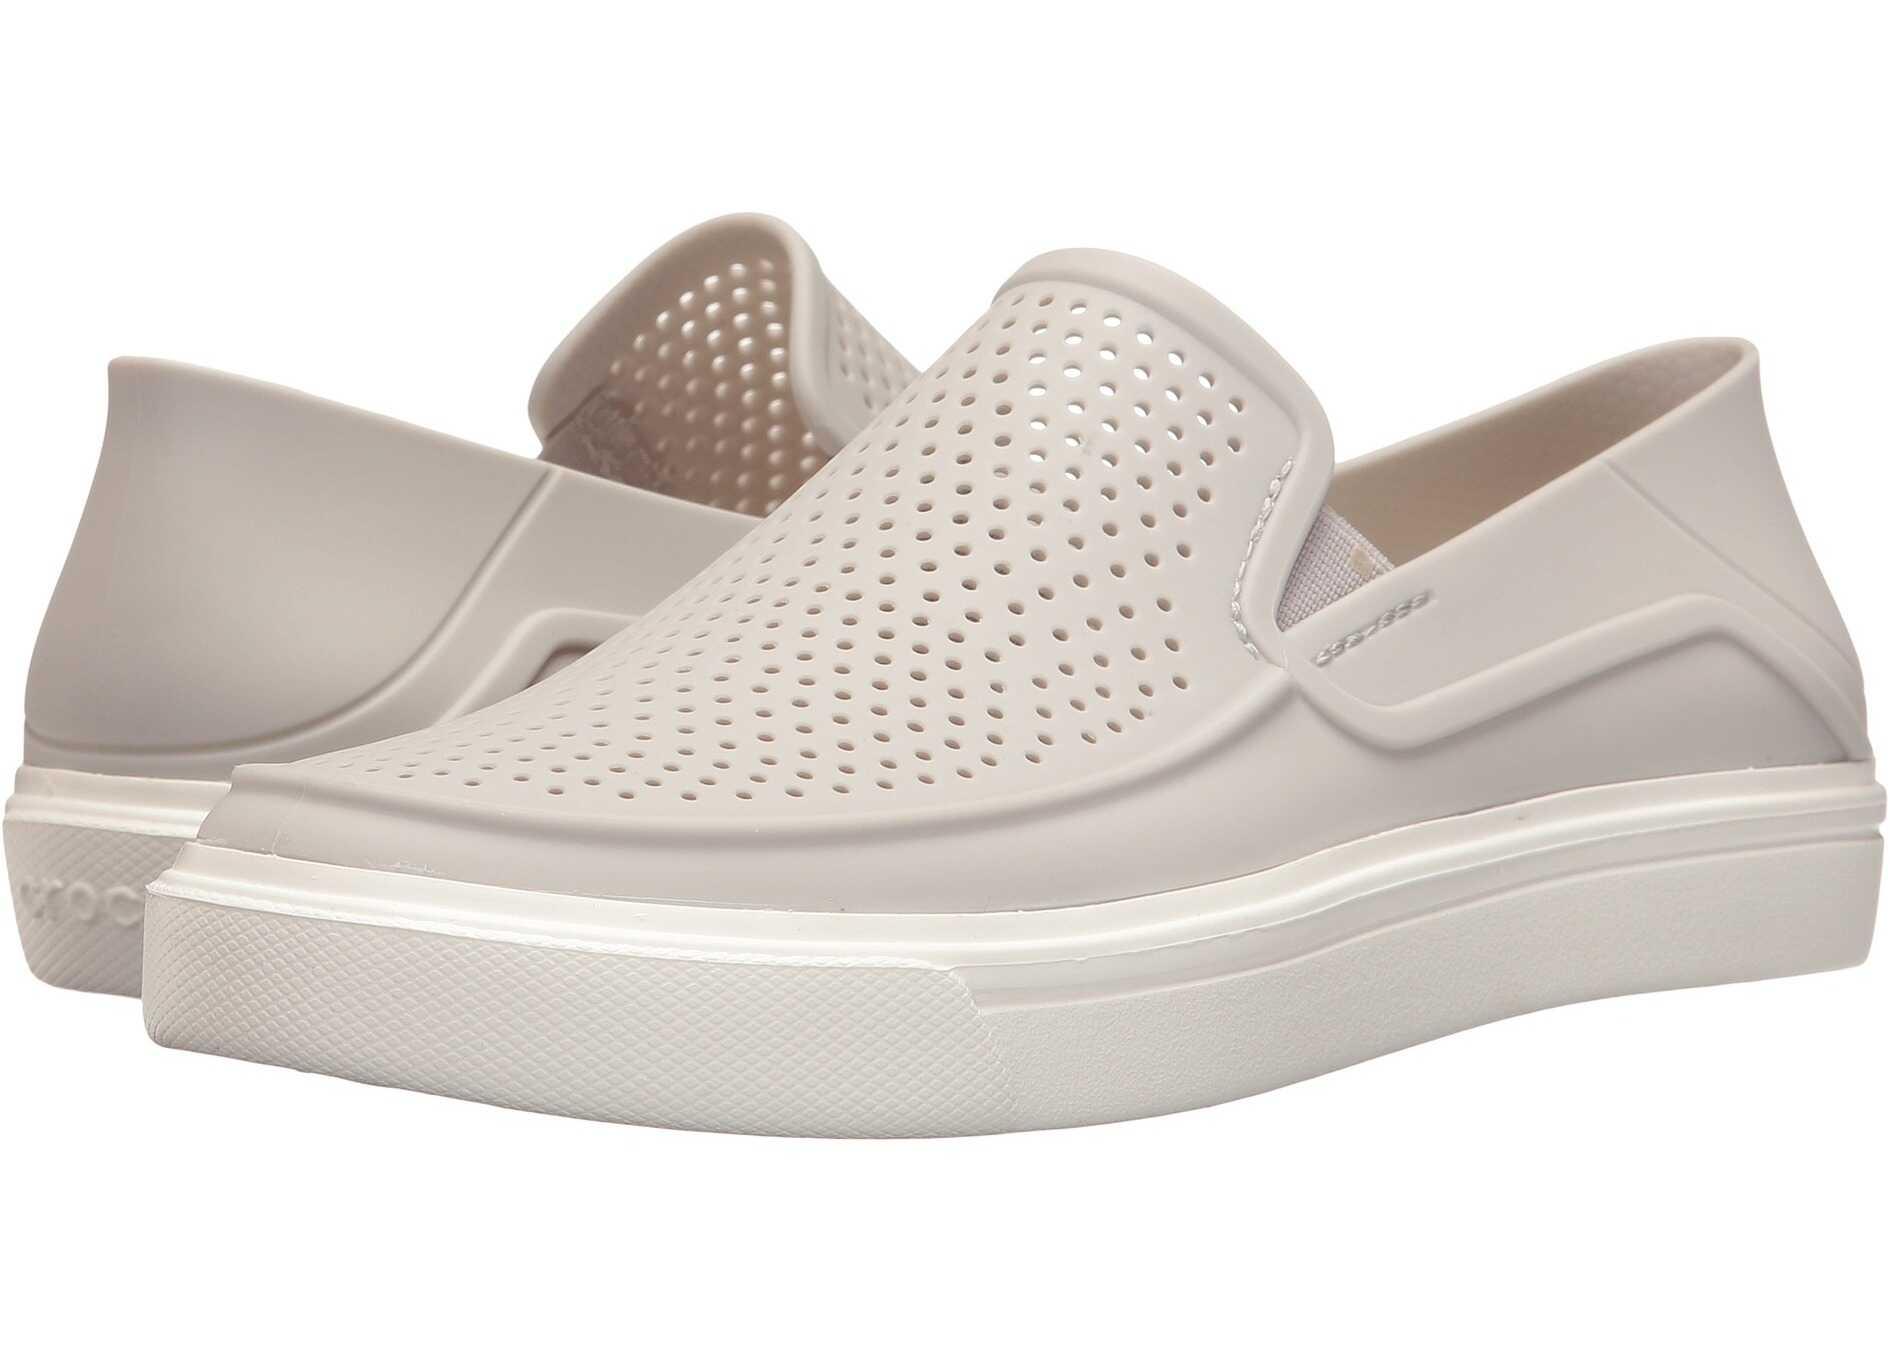 Crocs CitiLane Roka Slip-On Pearl White